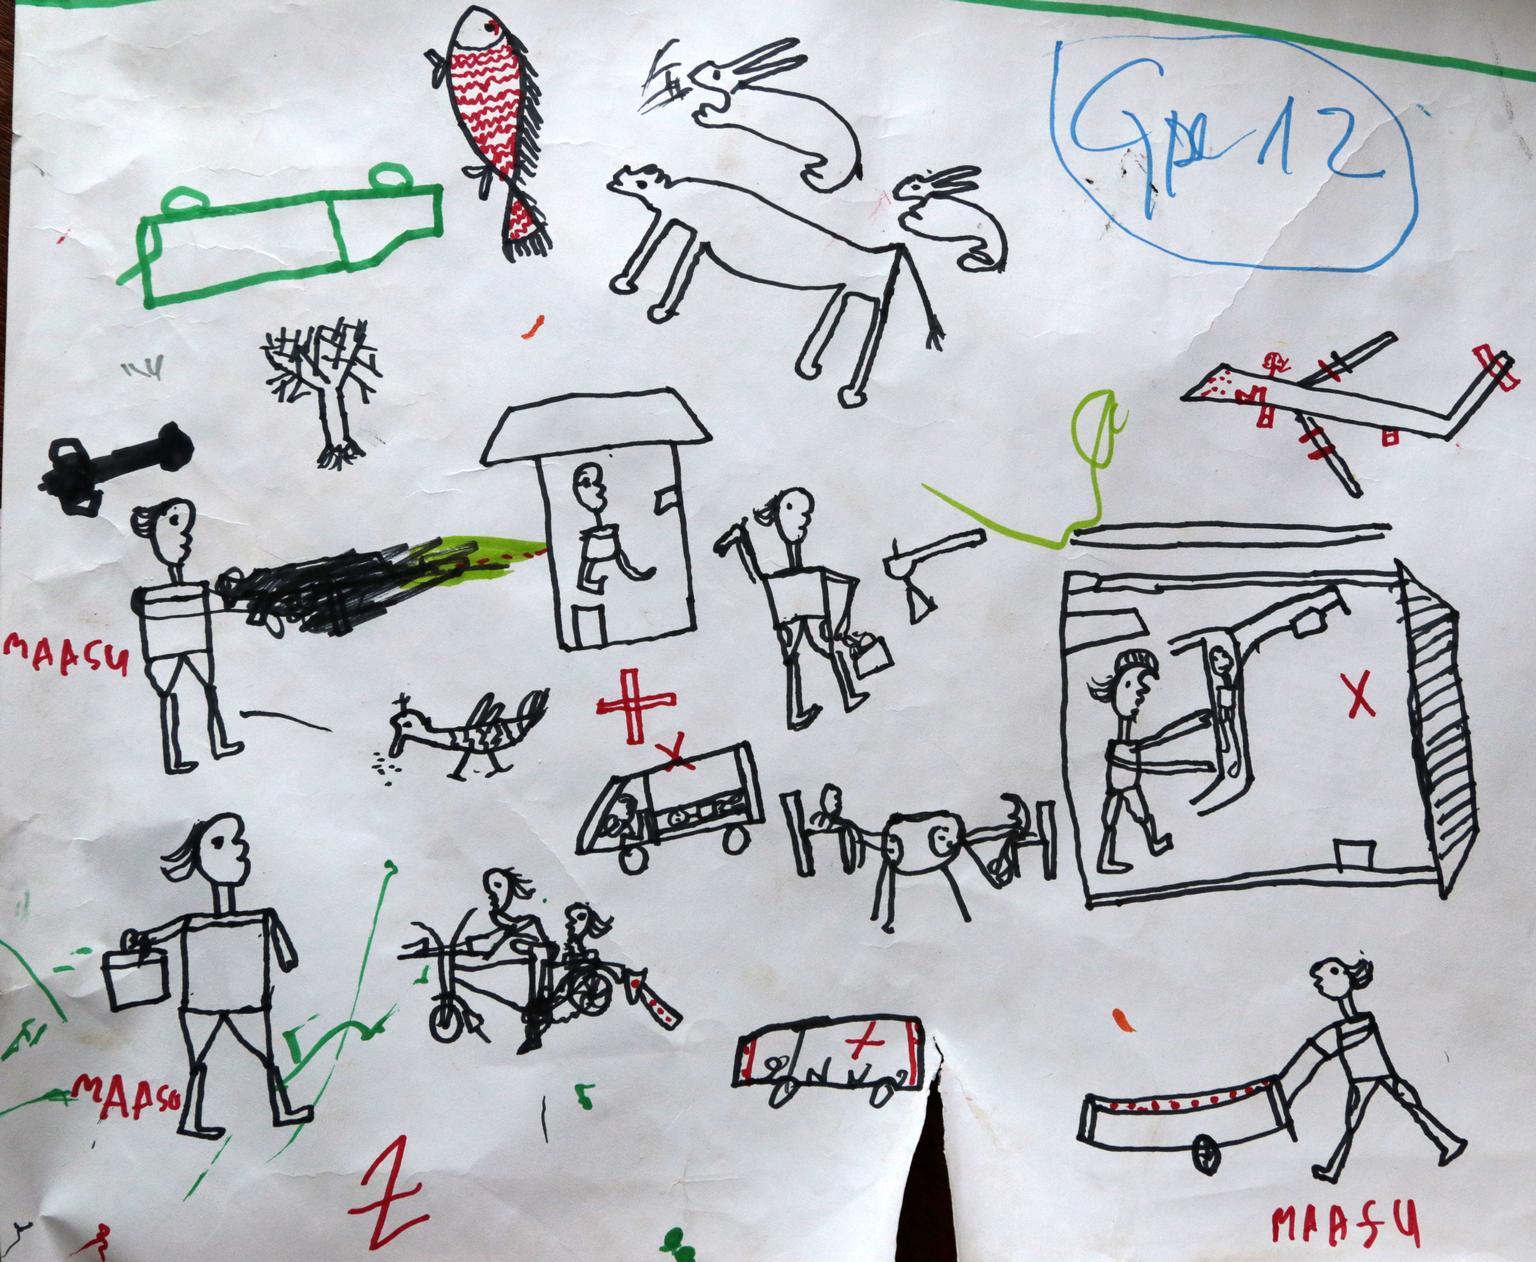 UNICEF/NYHQ2015-0721/Sali